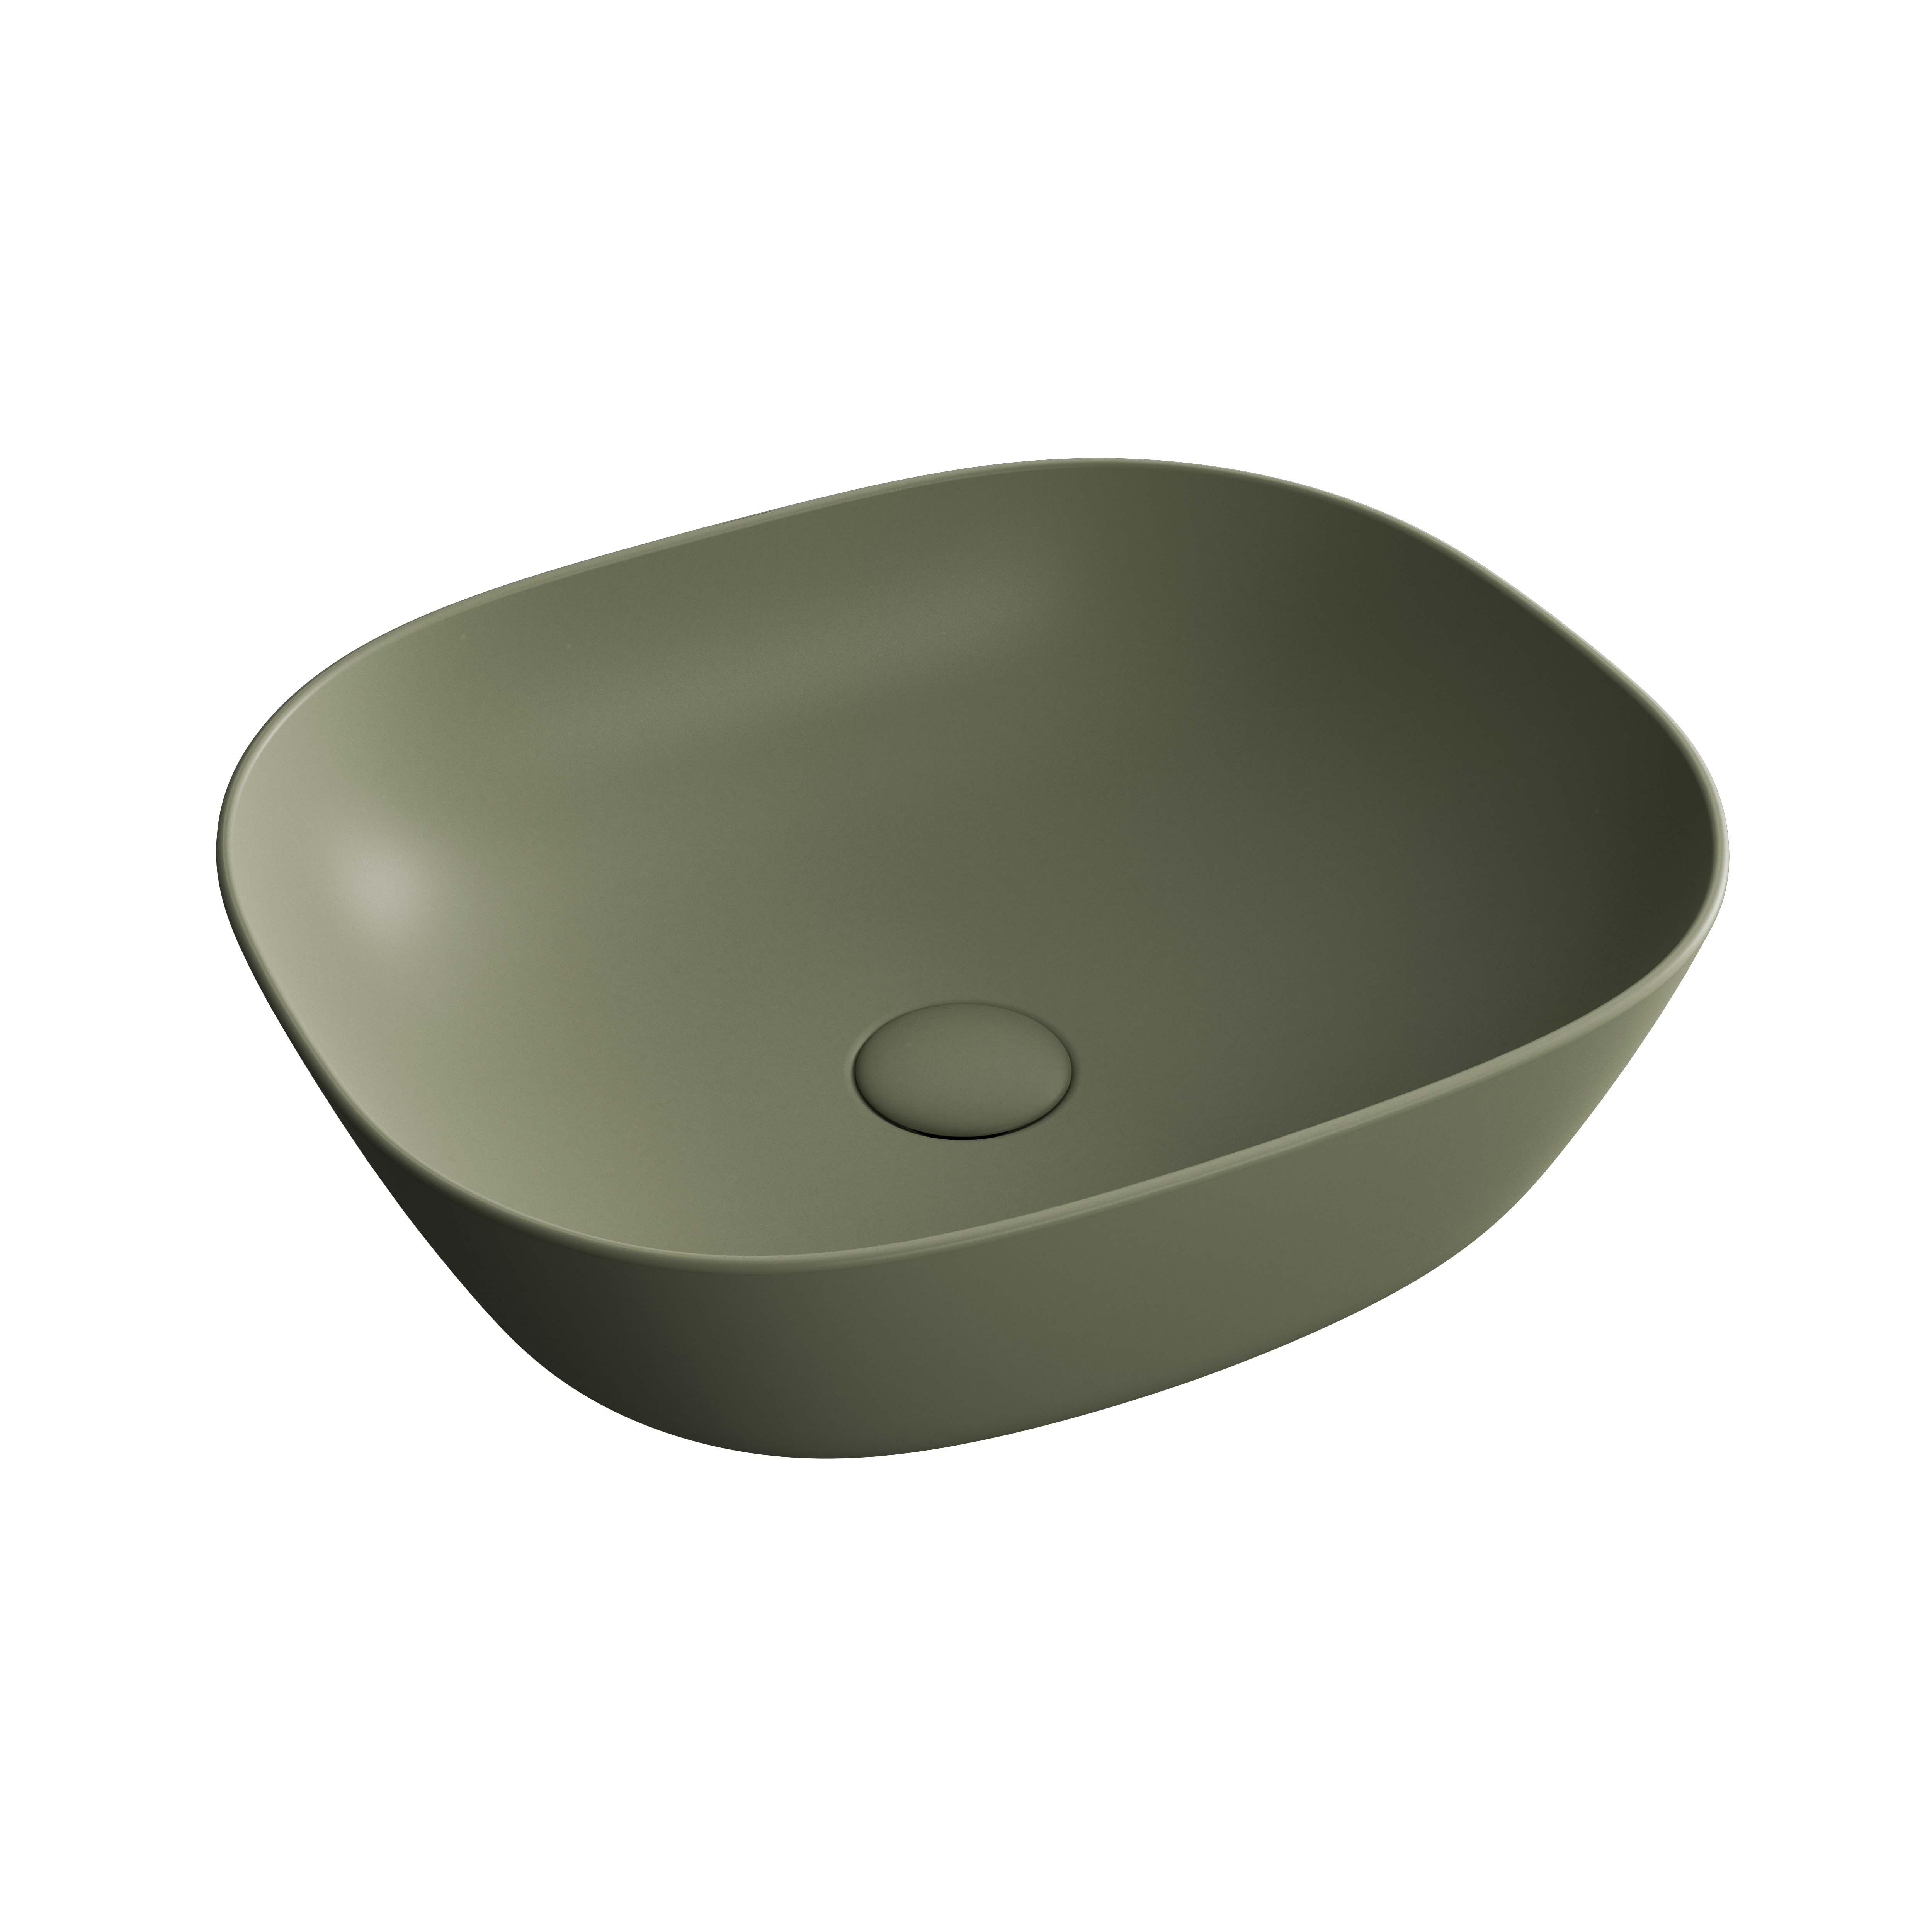 Plural vasque bas, vert mousse mat